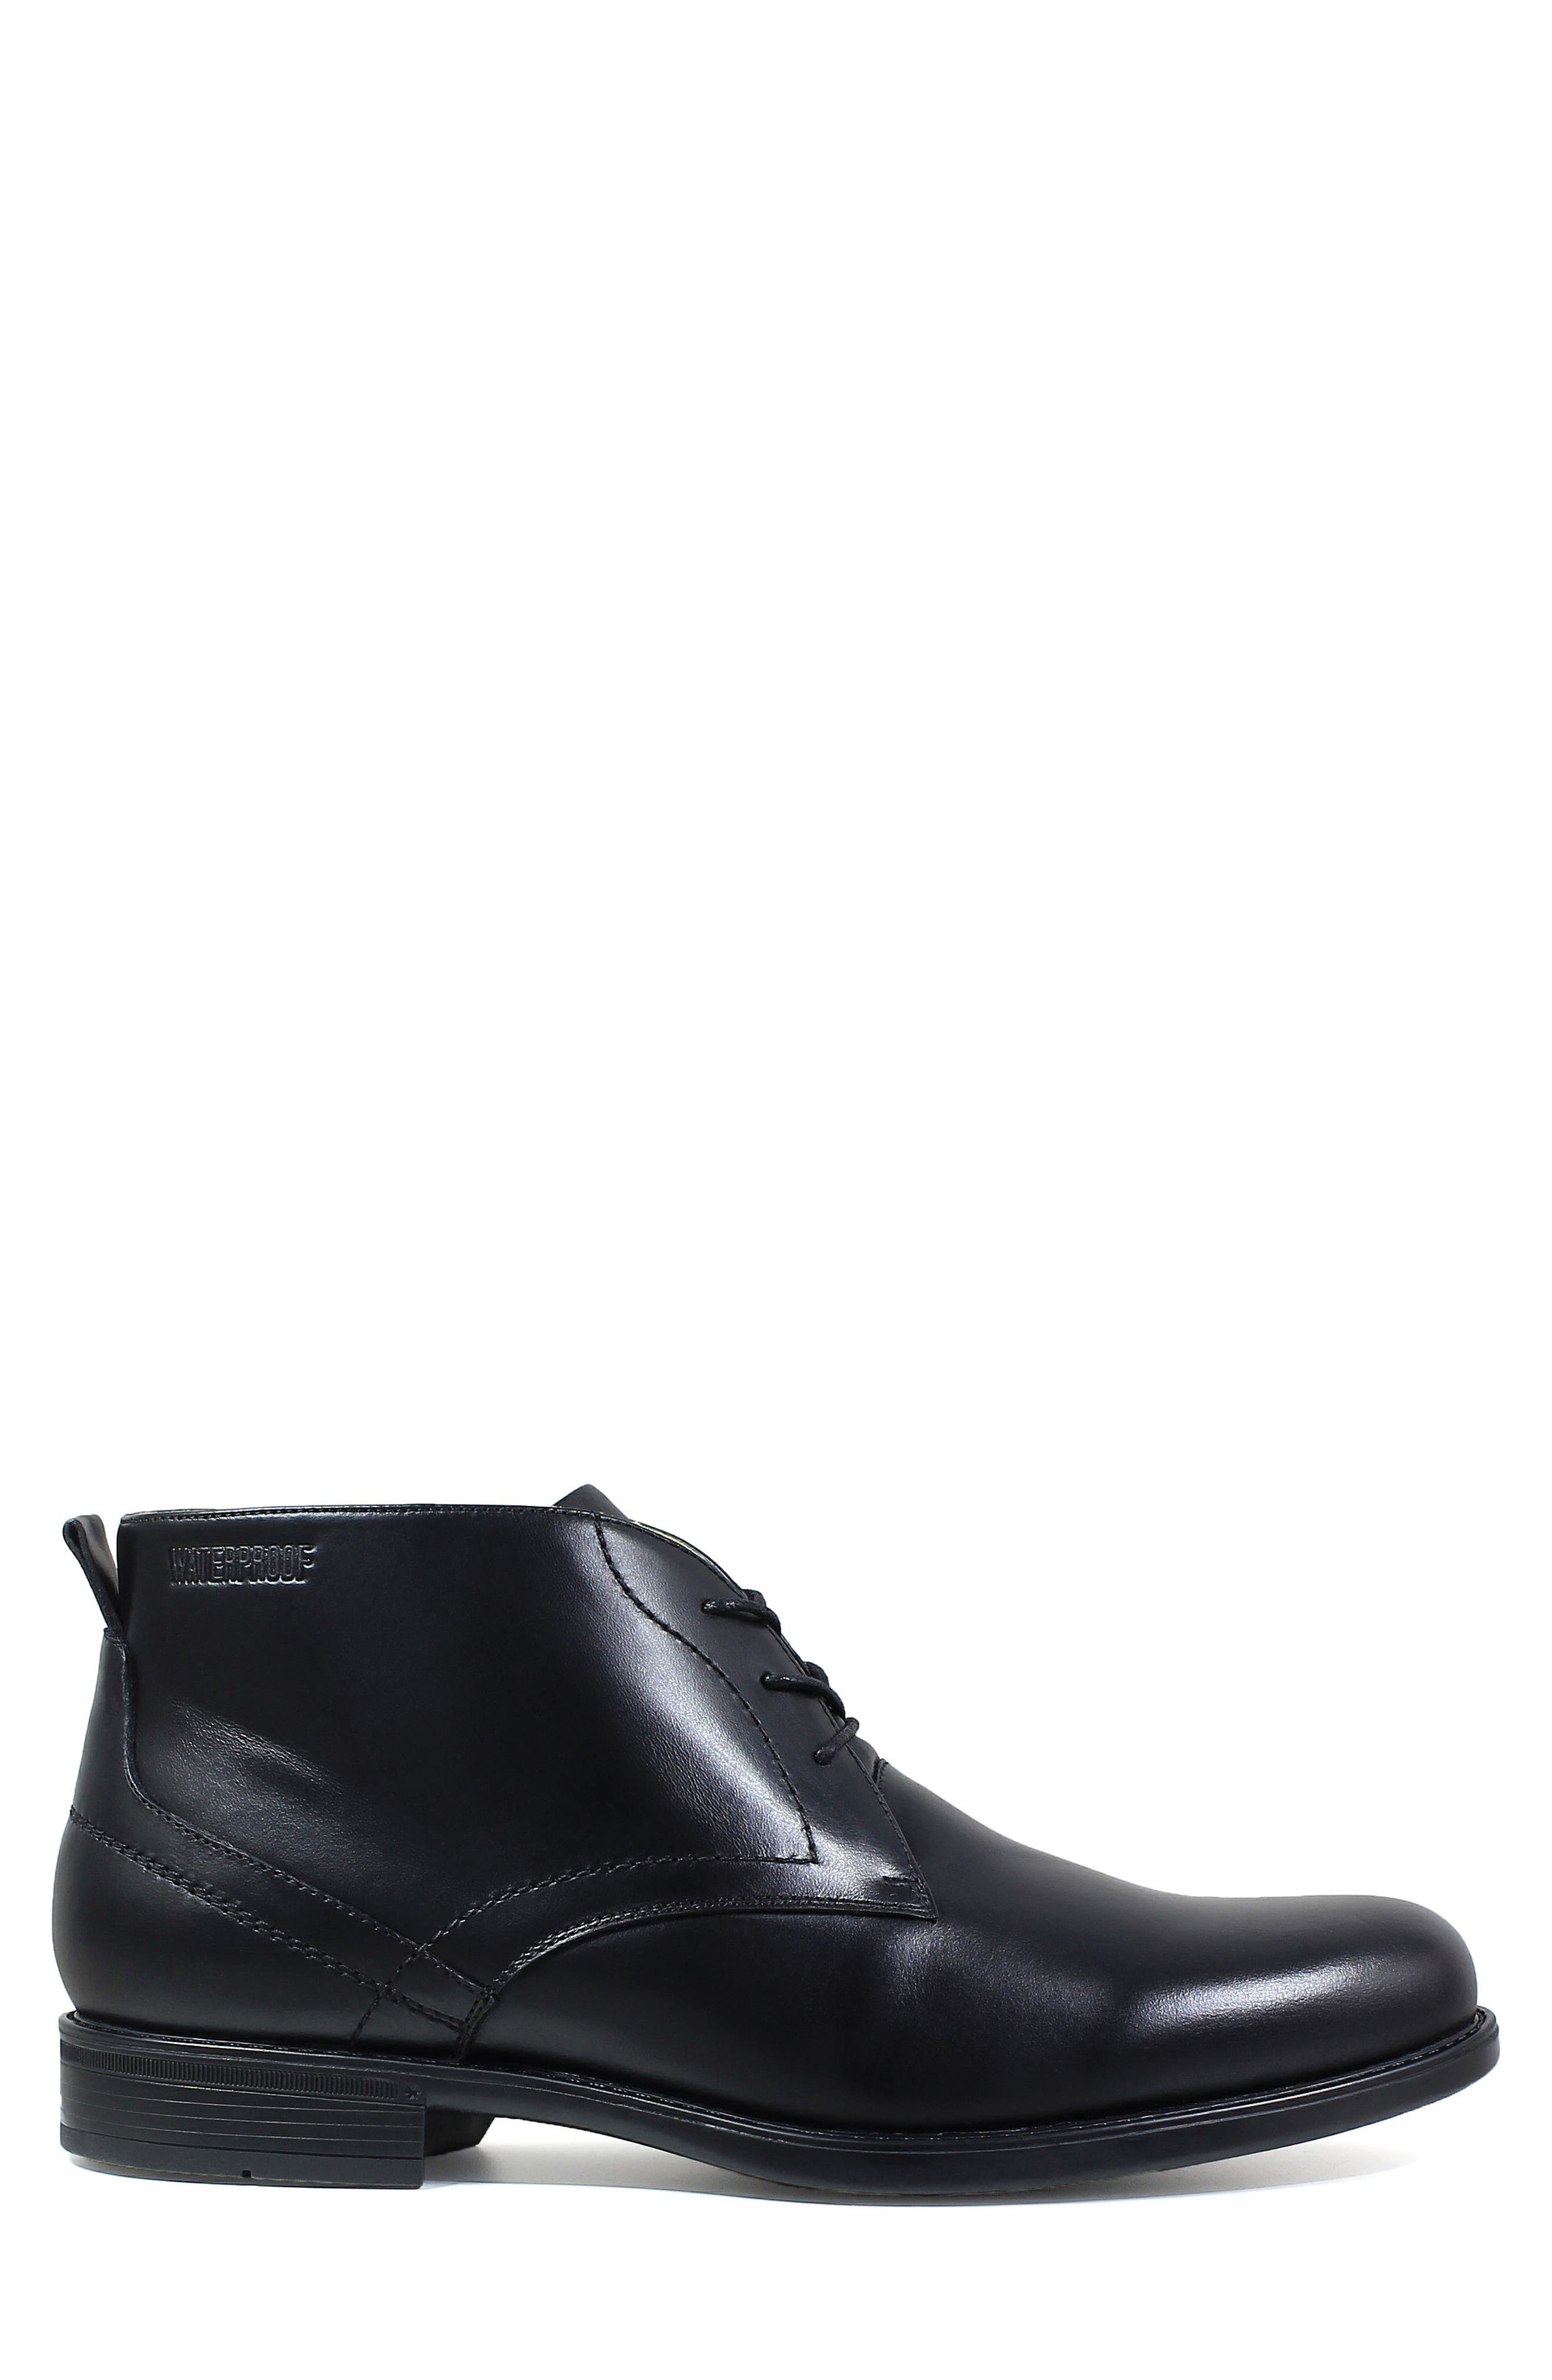 Midtown Waterproof Chukka Boot,                             Alternate thumbnail 3, color,                             Black